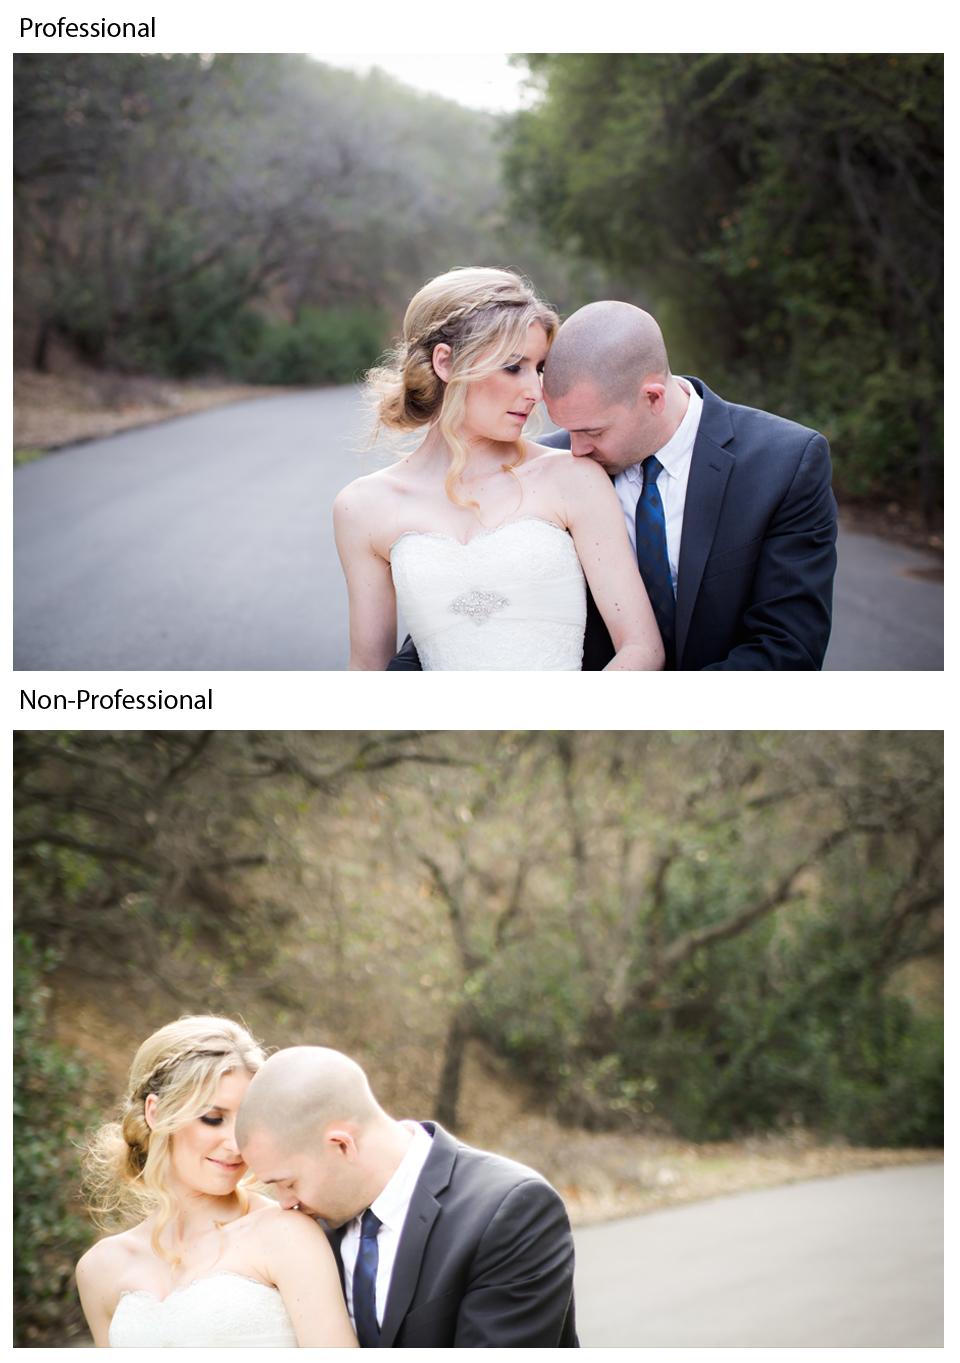 professional vs amateur wedding photographers